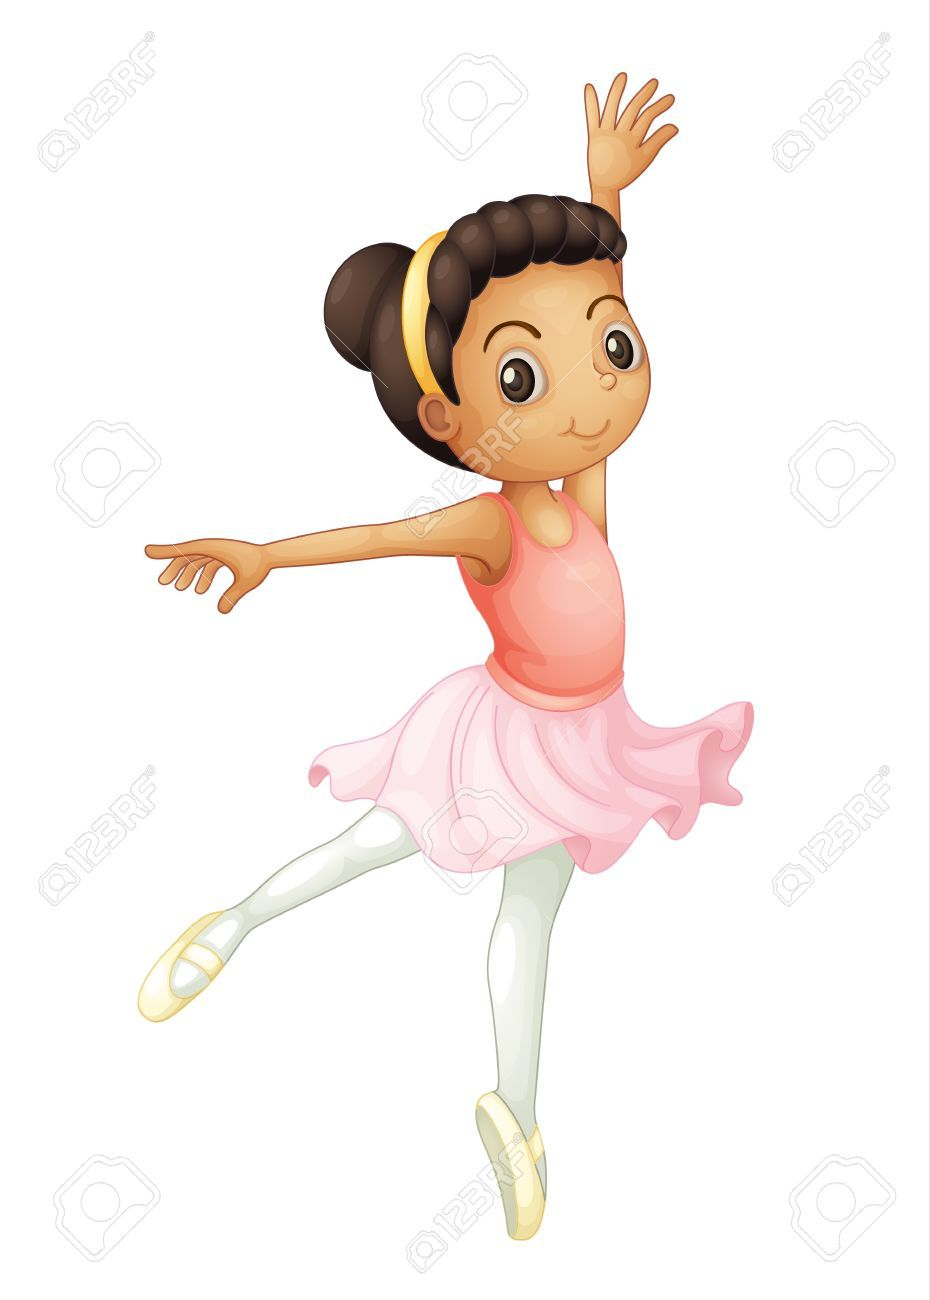 medium resolution of wallpapers little dance girl bfbfdceebfc kids ballet illustration of a clipart dancing 930x1300 62362 little dance girl